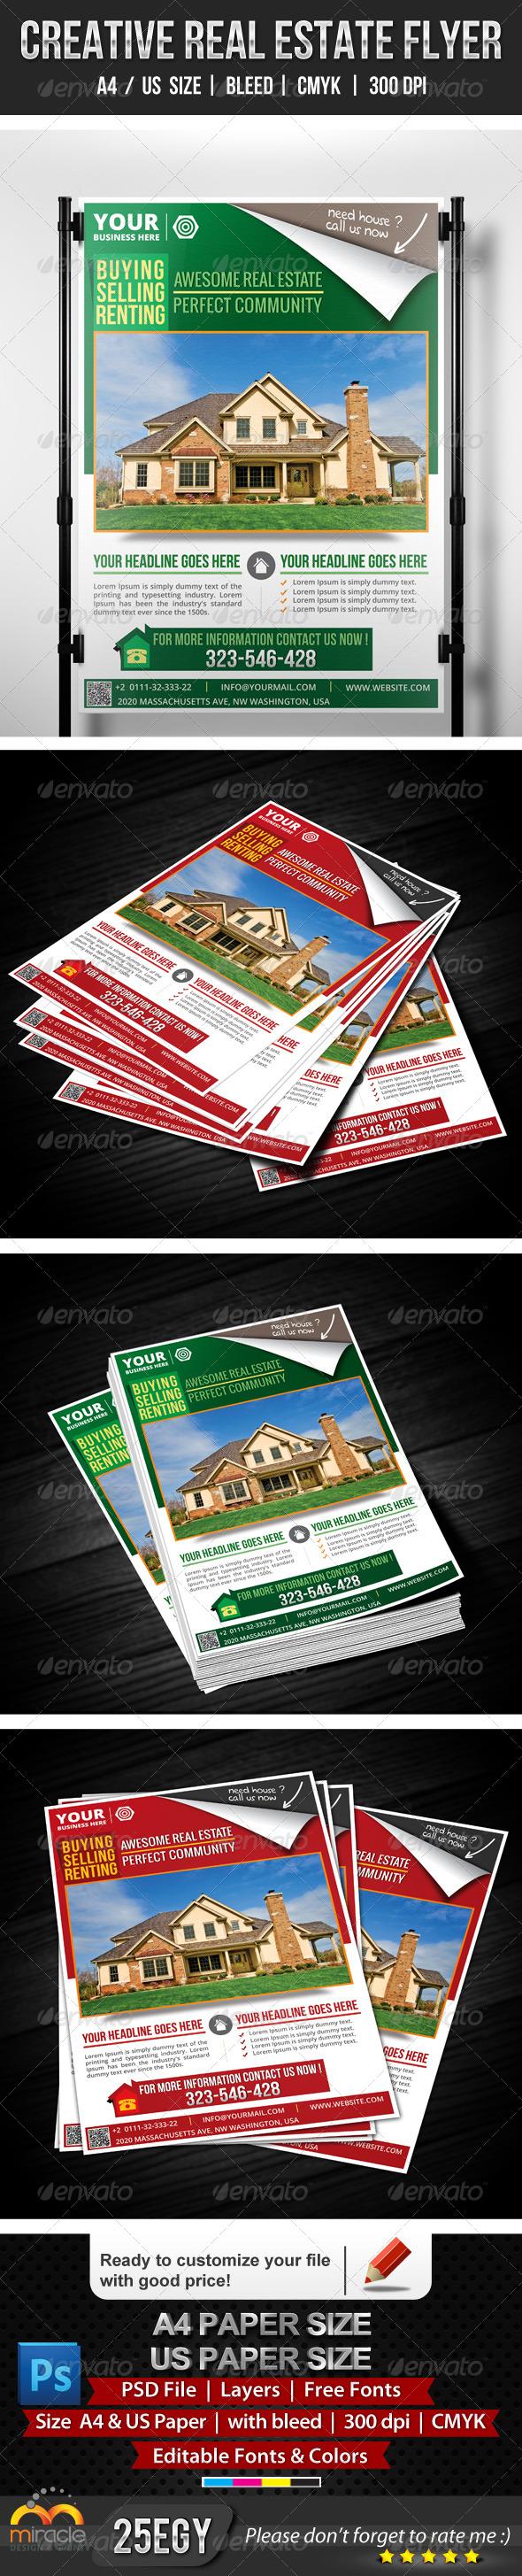 GraphicRiver Creative Real Estate Flyer 5249009